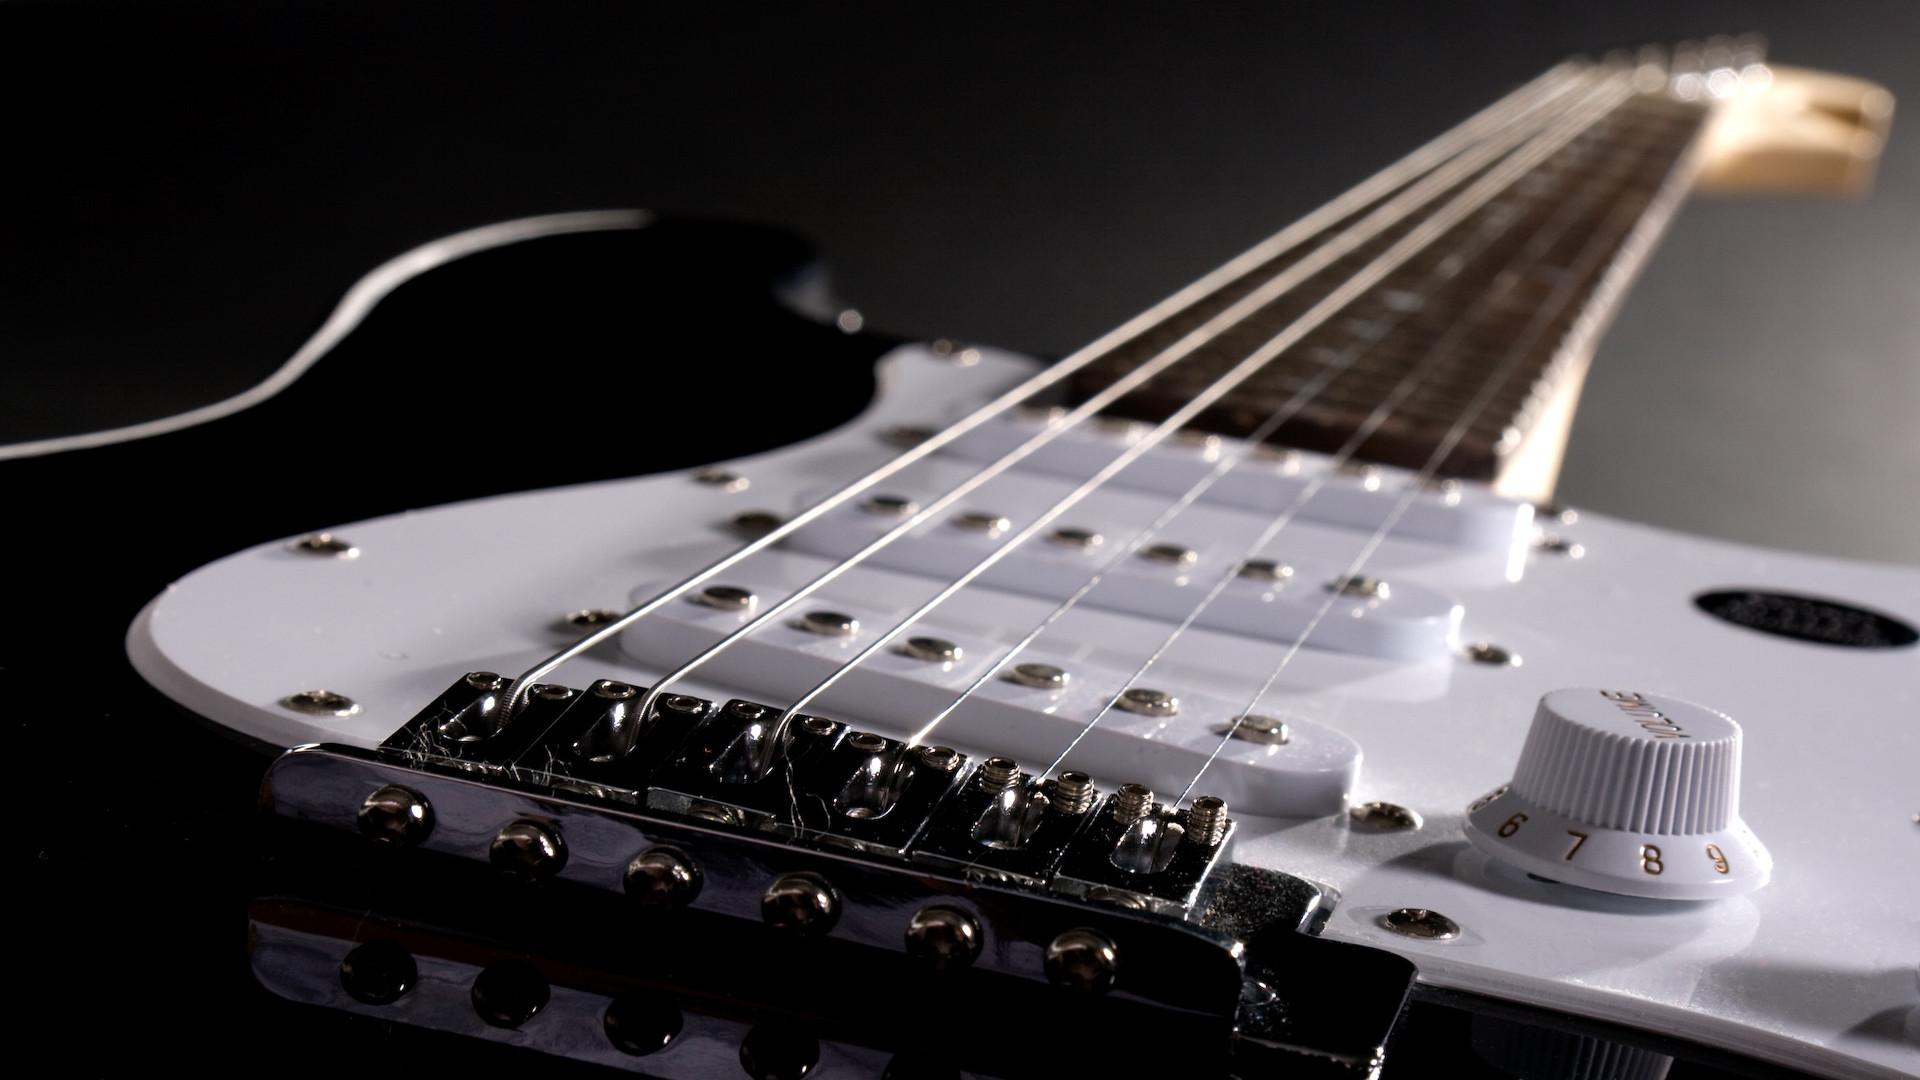 High Resolution Guitar Wallpaper HD Full Size – SiWallpaperHD 17250